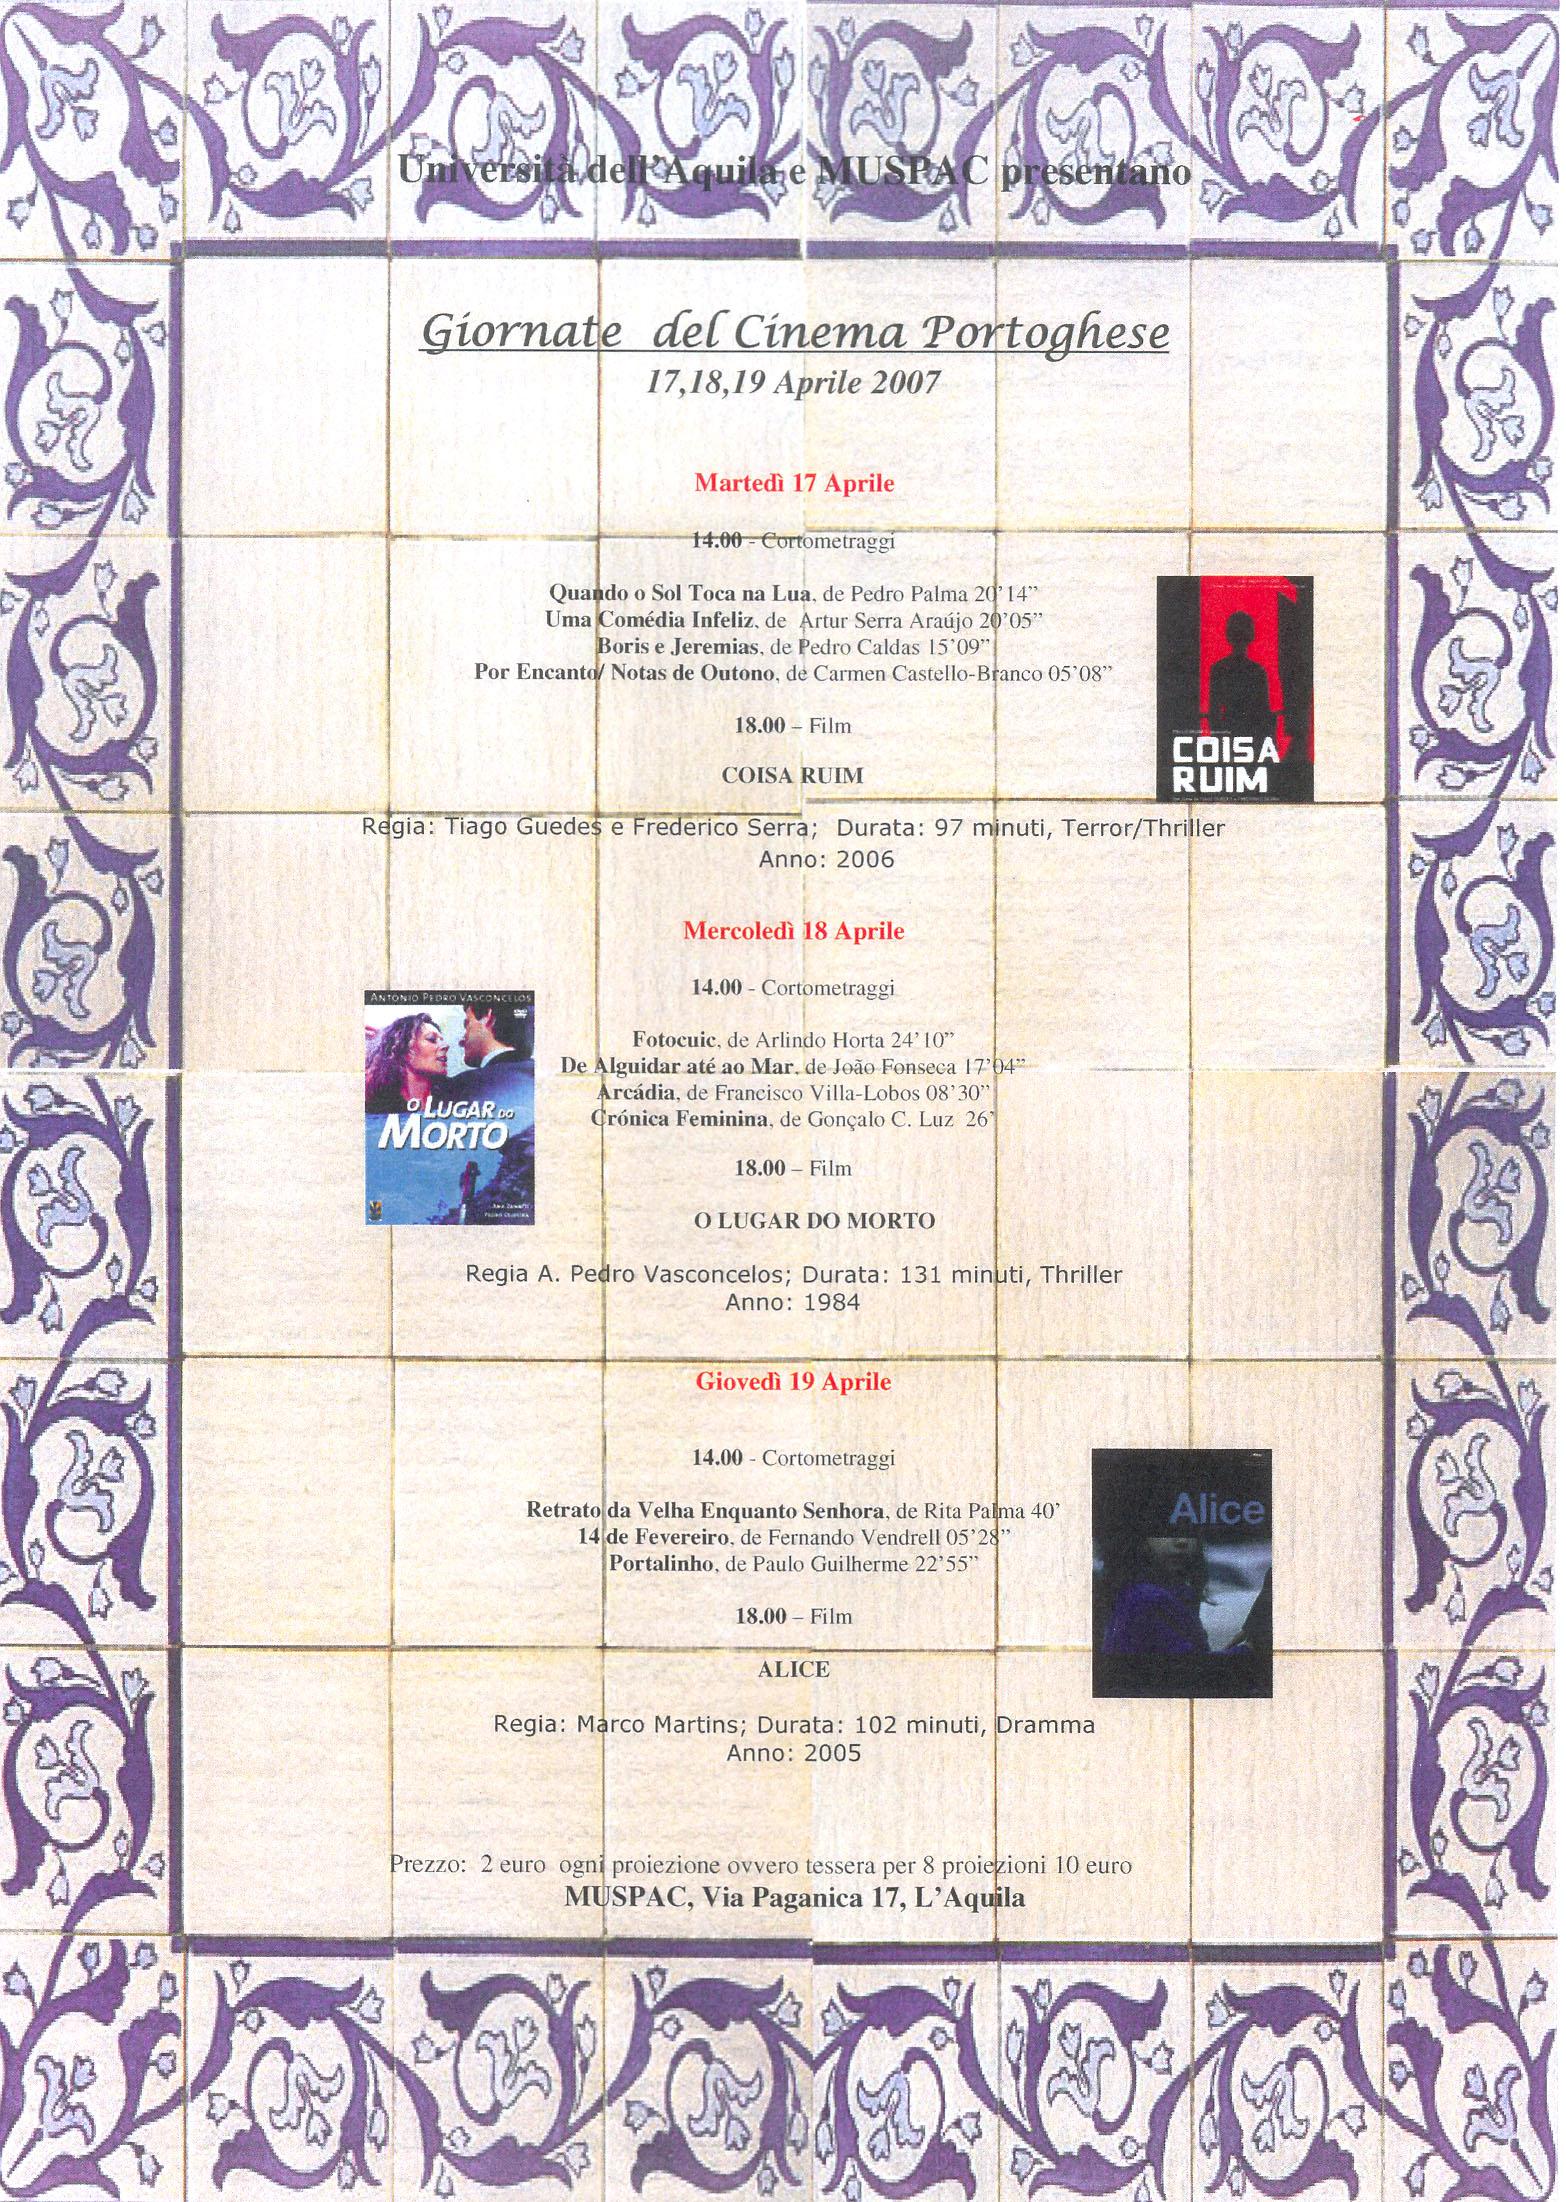 giornata cinema portoghese